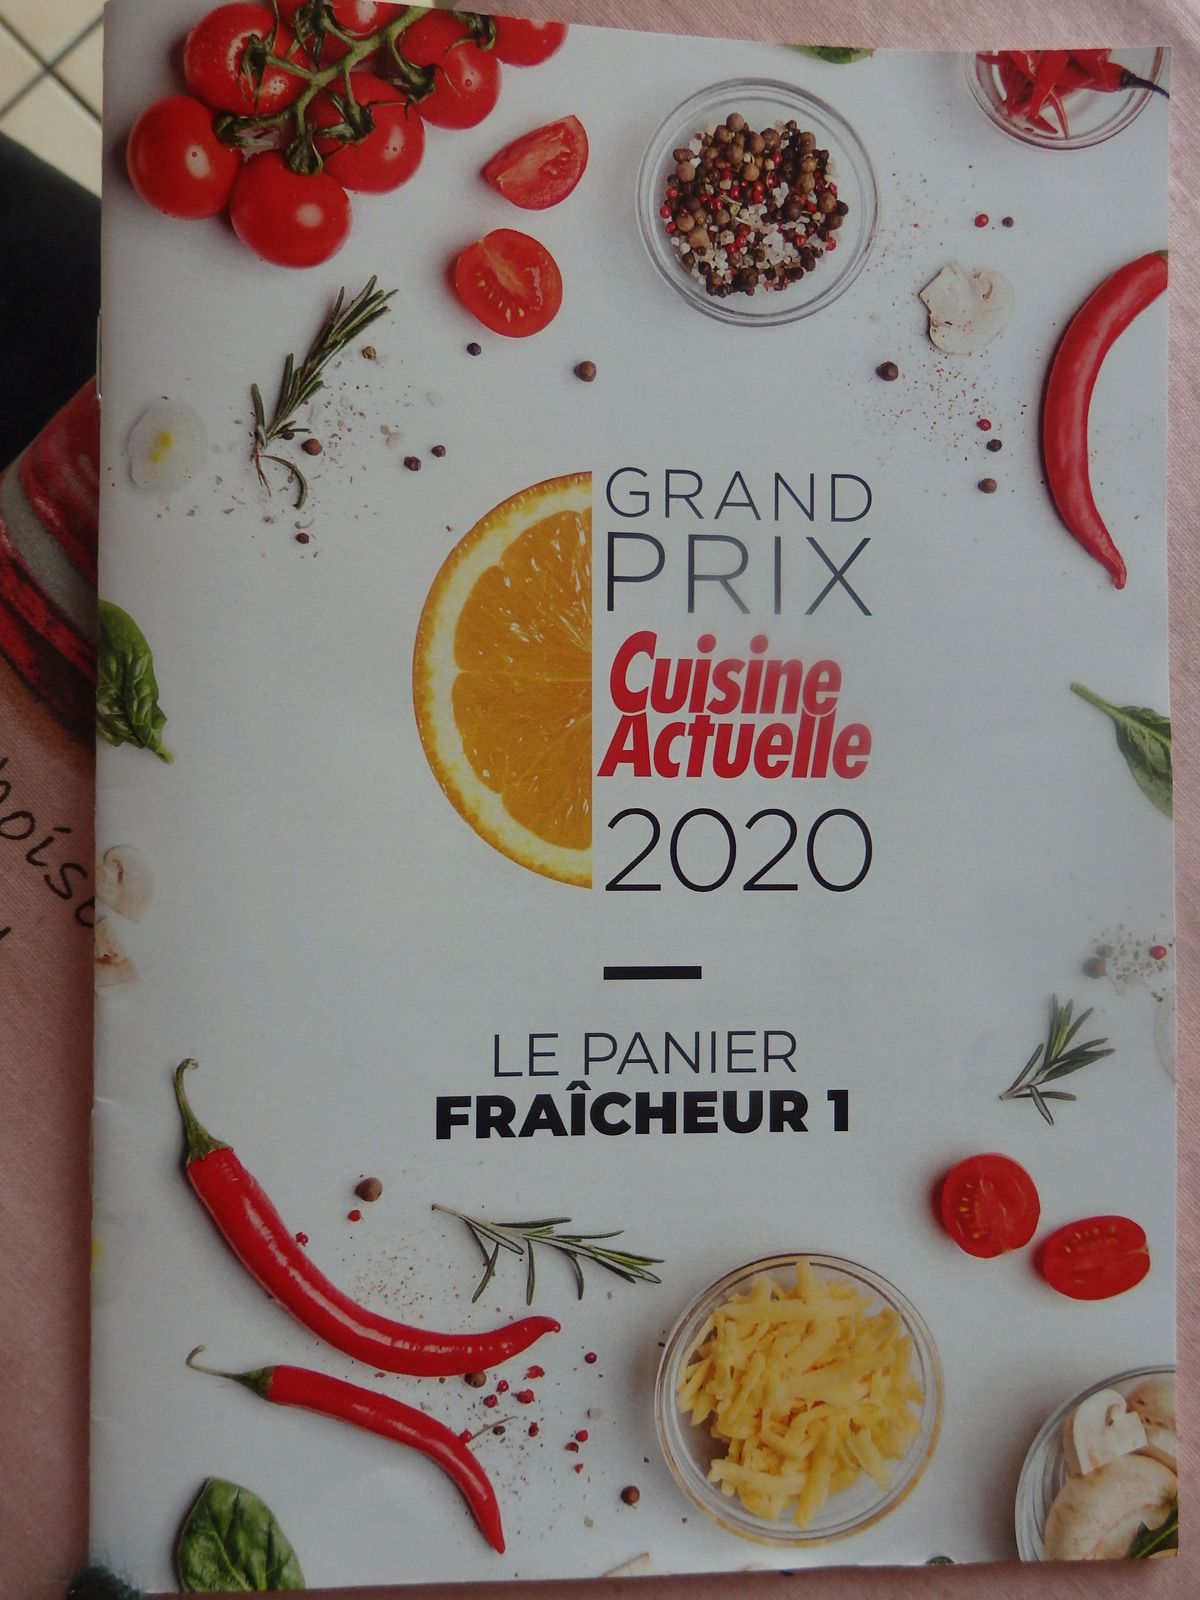 Grand prix Cuisine Actuelle 2020